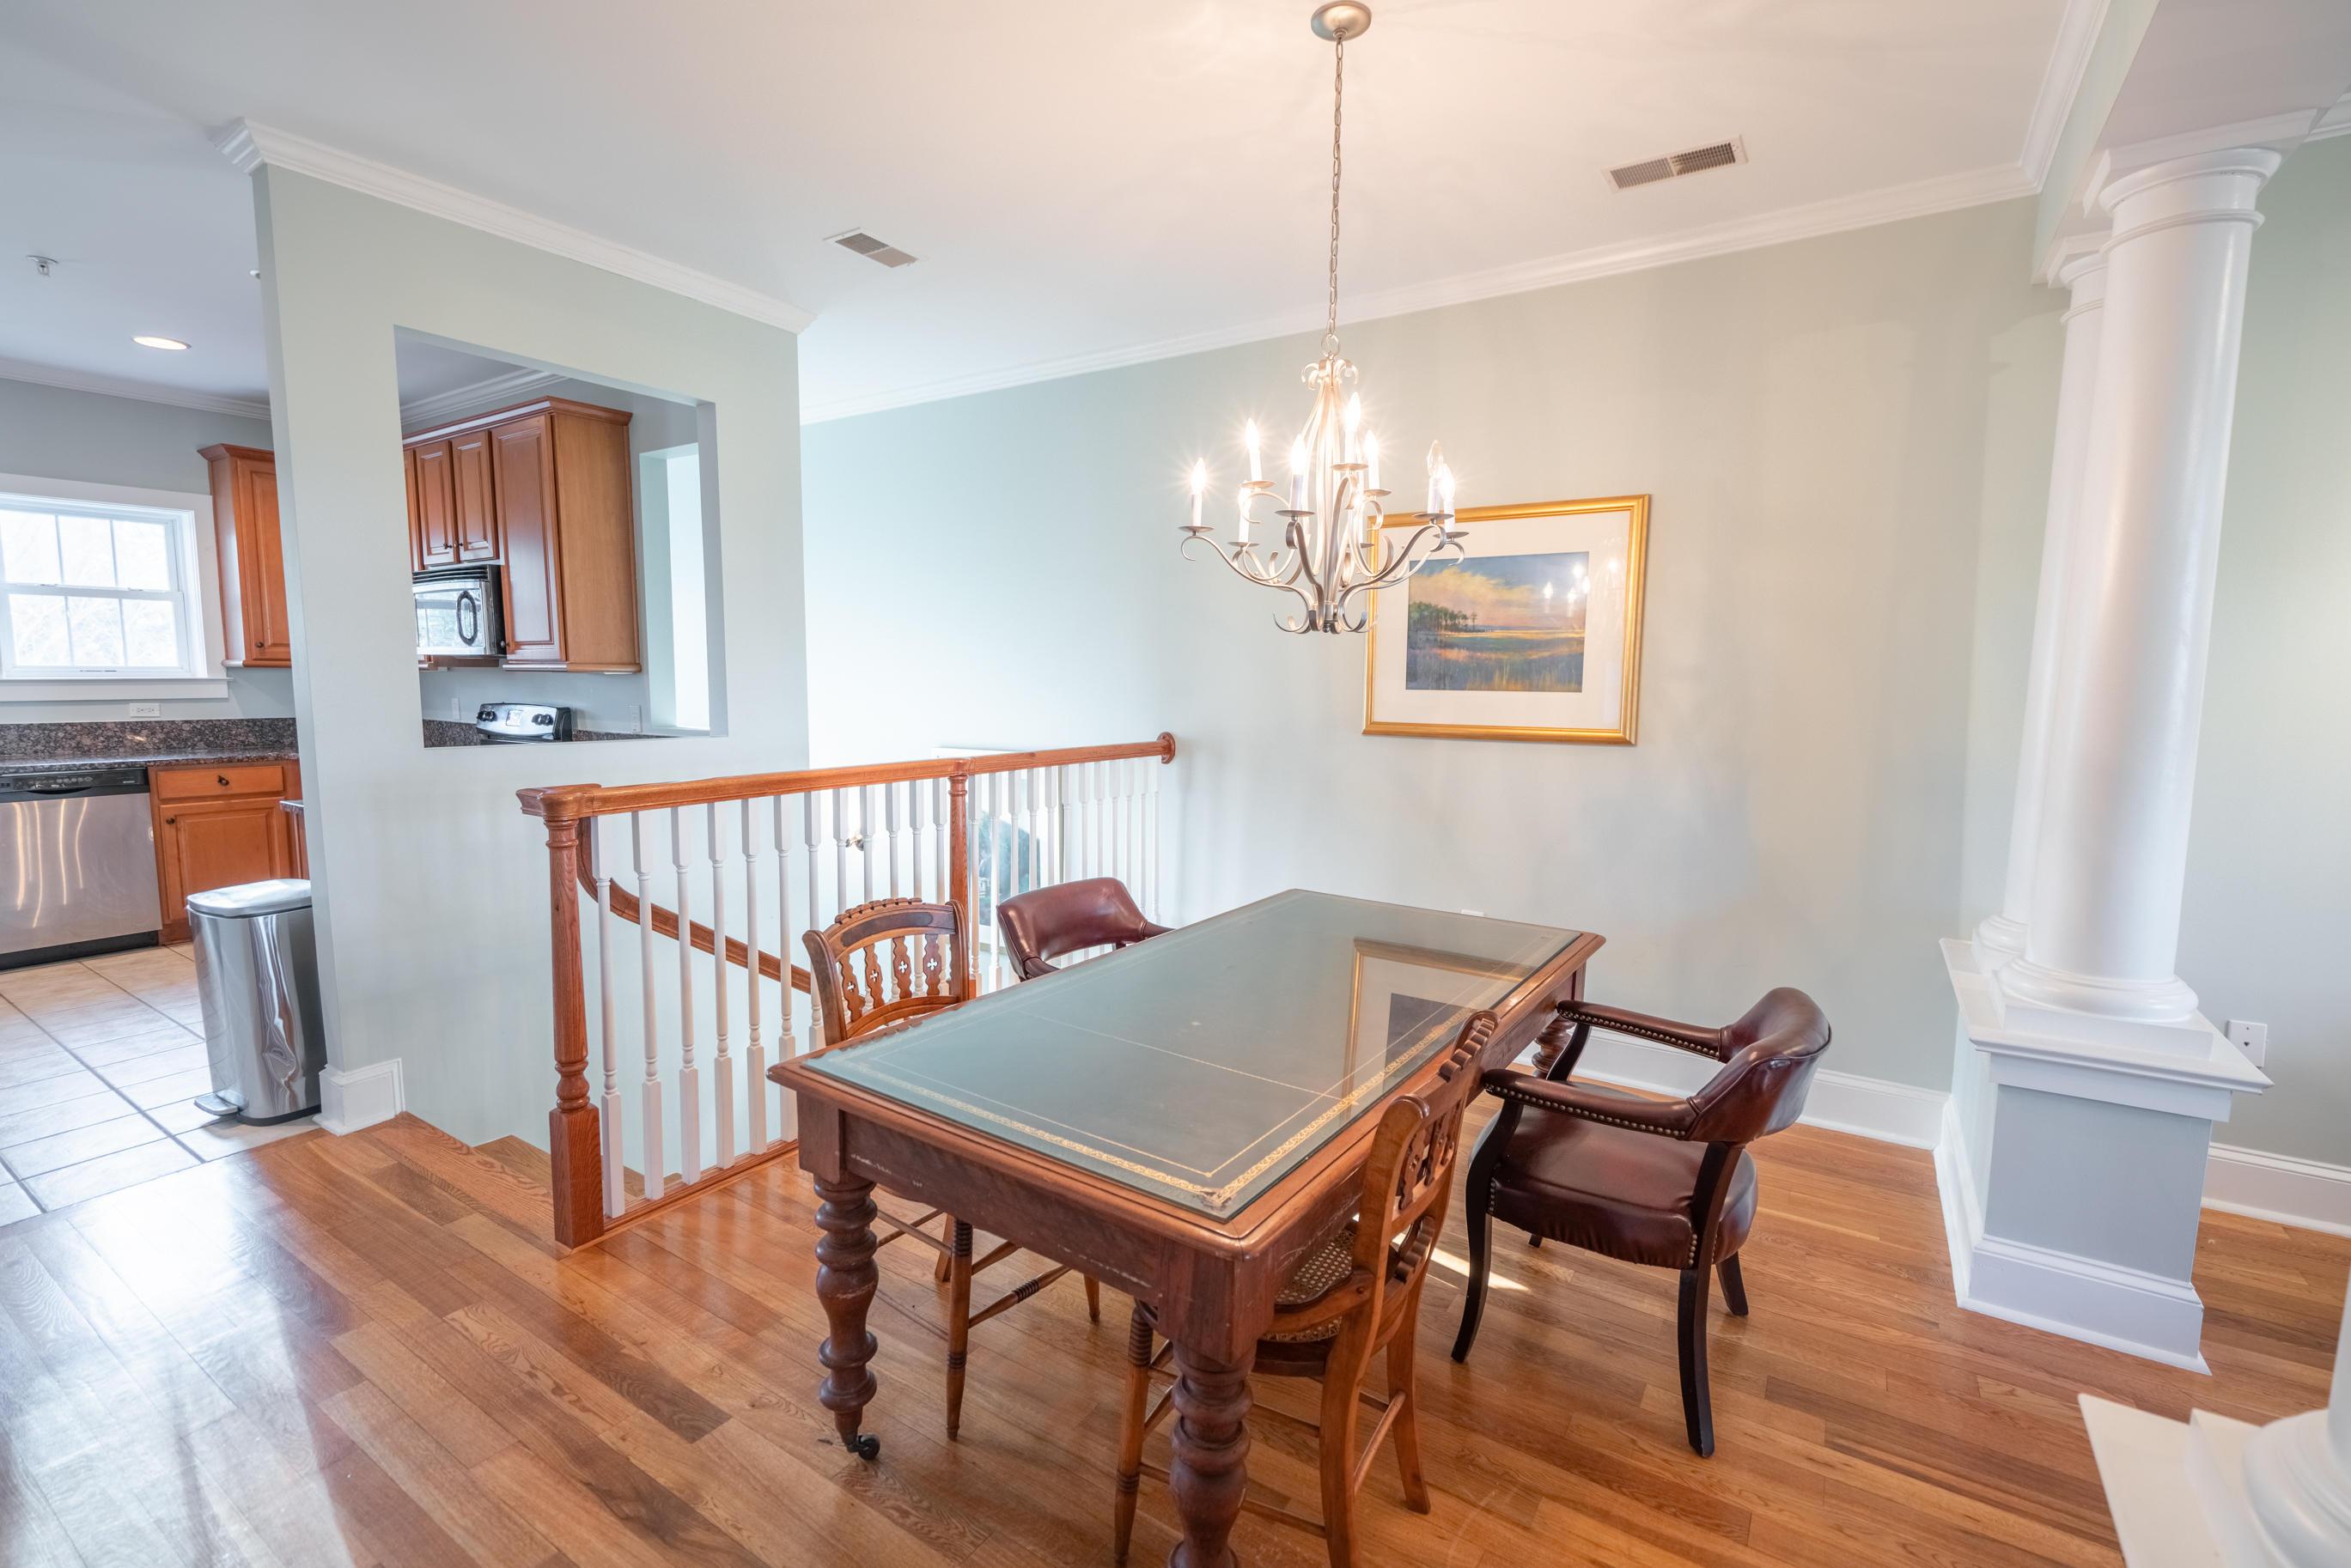 Etiwan Pointe Homes For Sale - 132 Winding Creek, Mount Pleasant, SC - 23